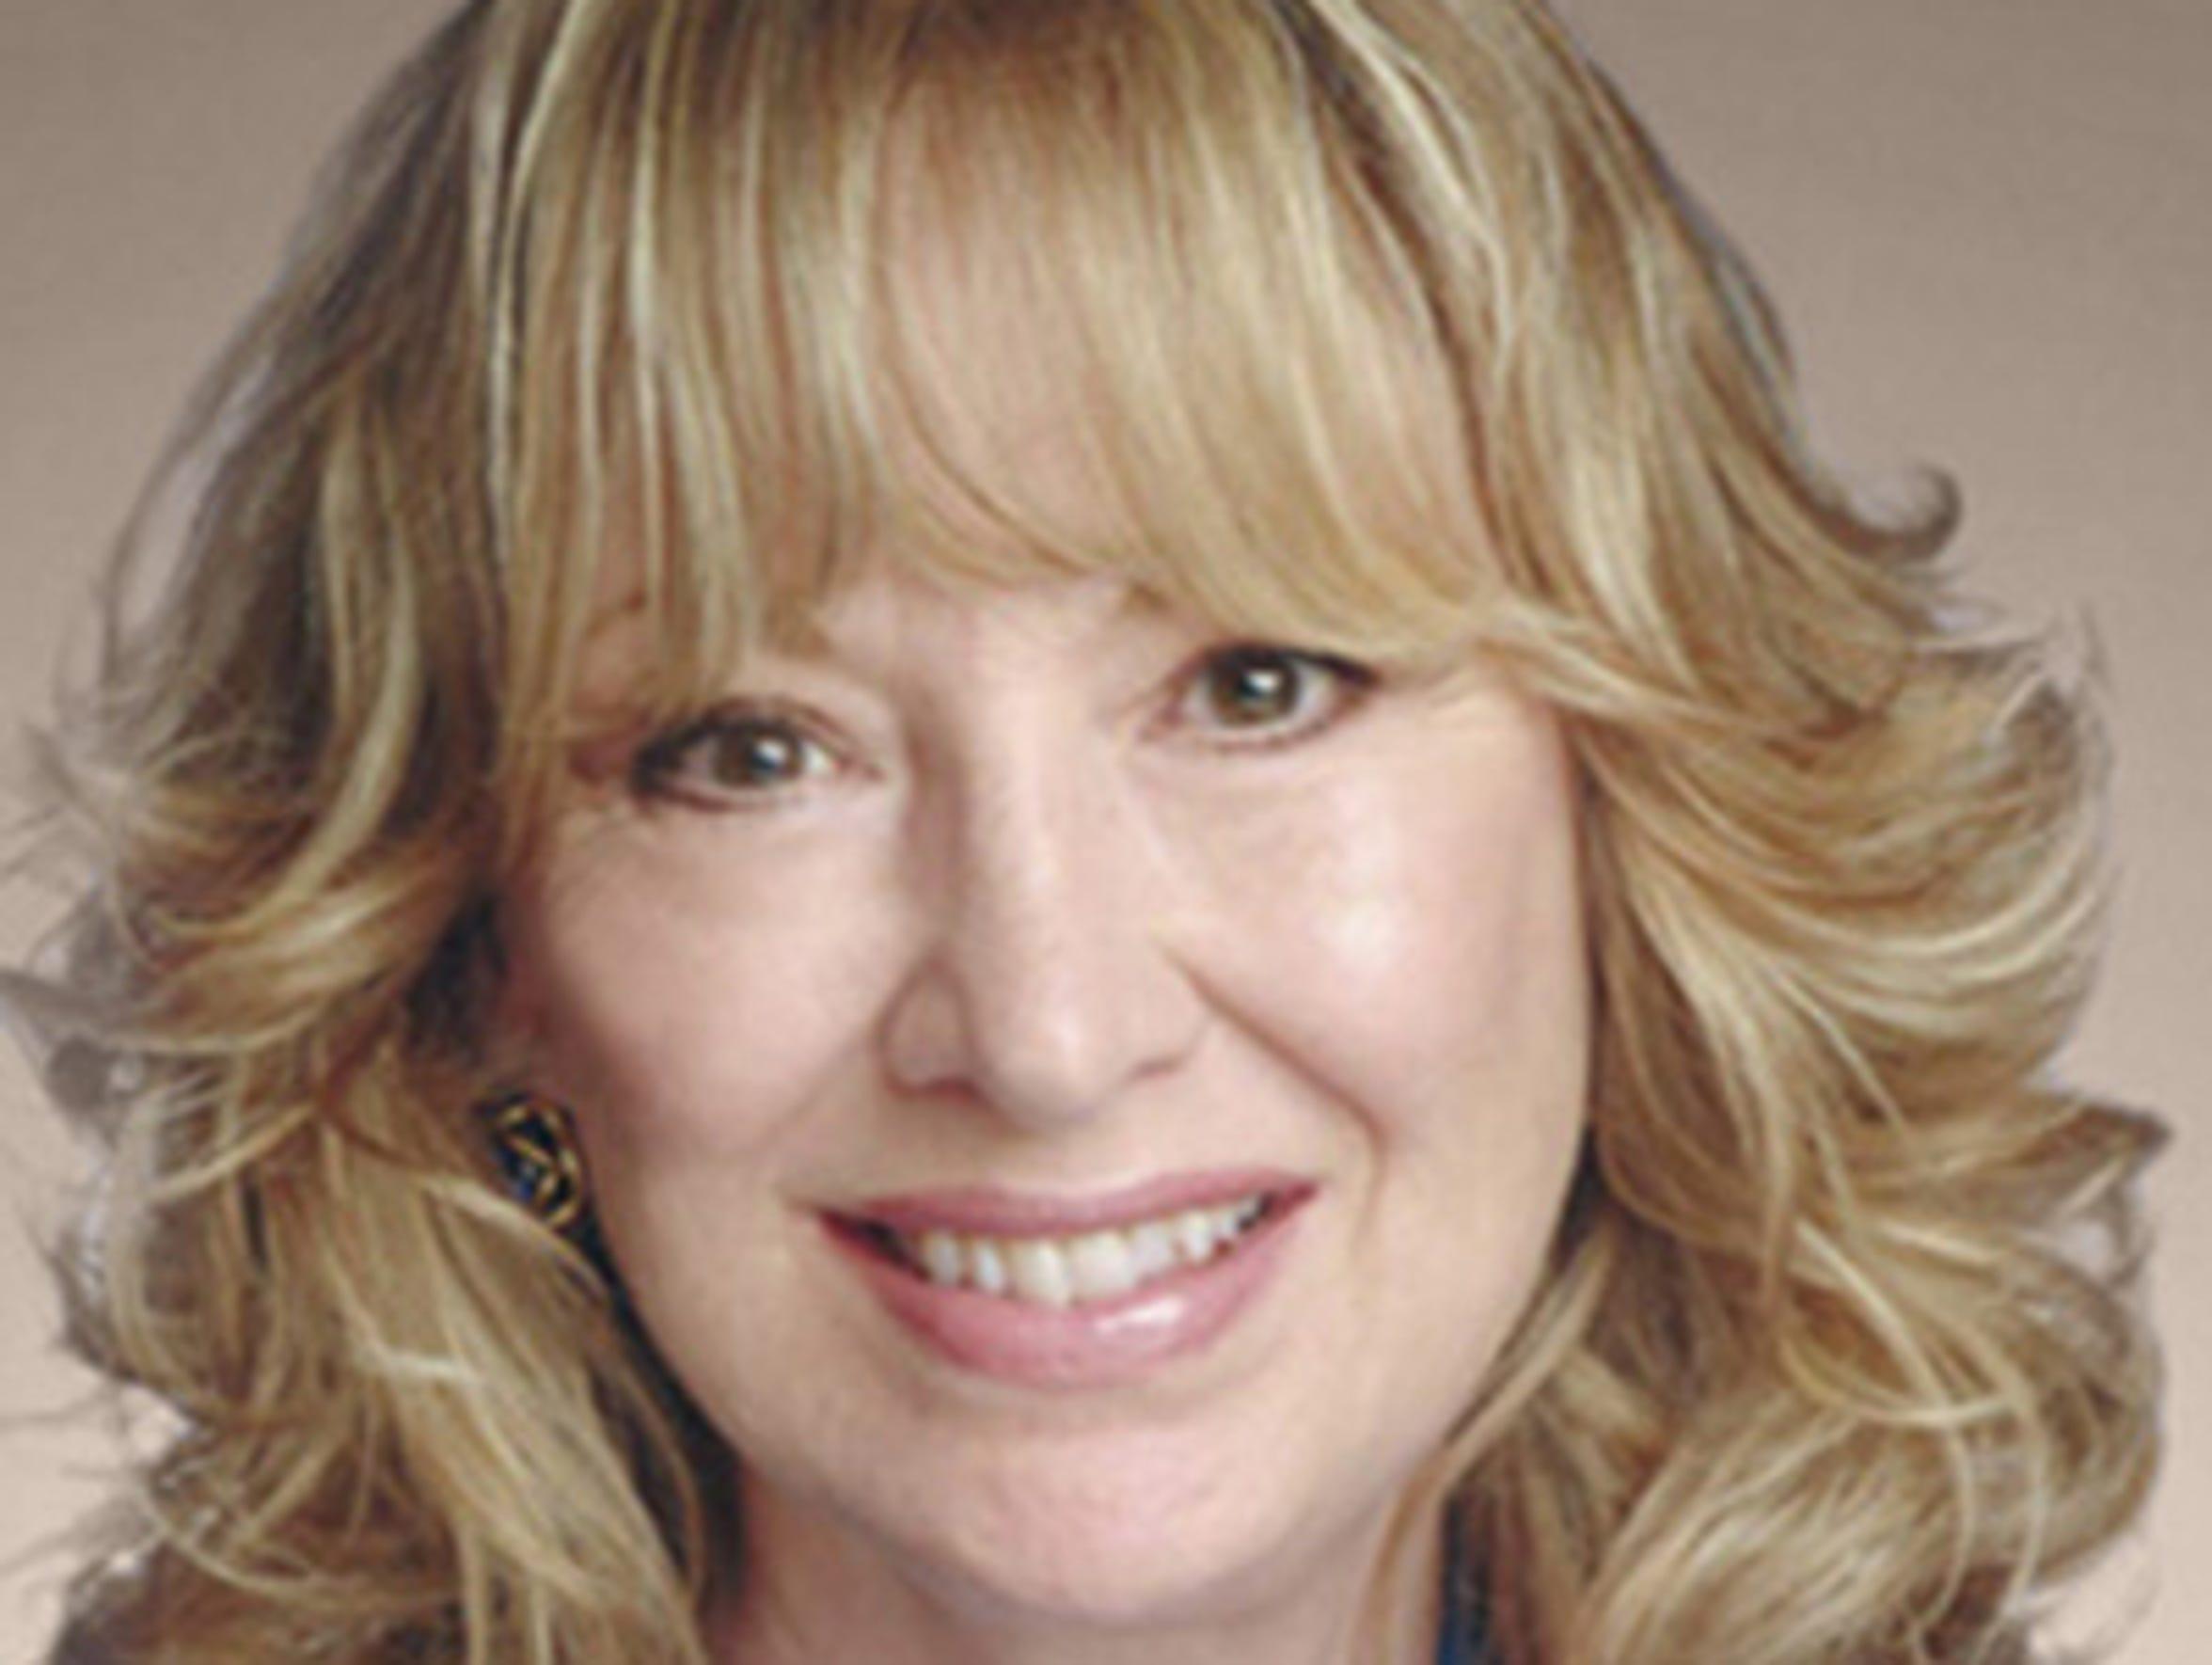 Rep. Sherry Jones, D-Nashville